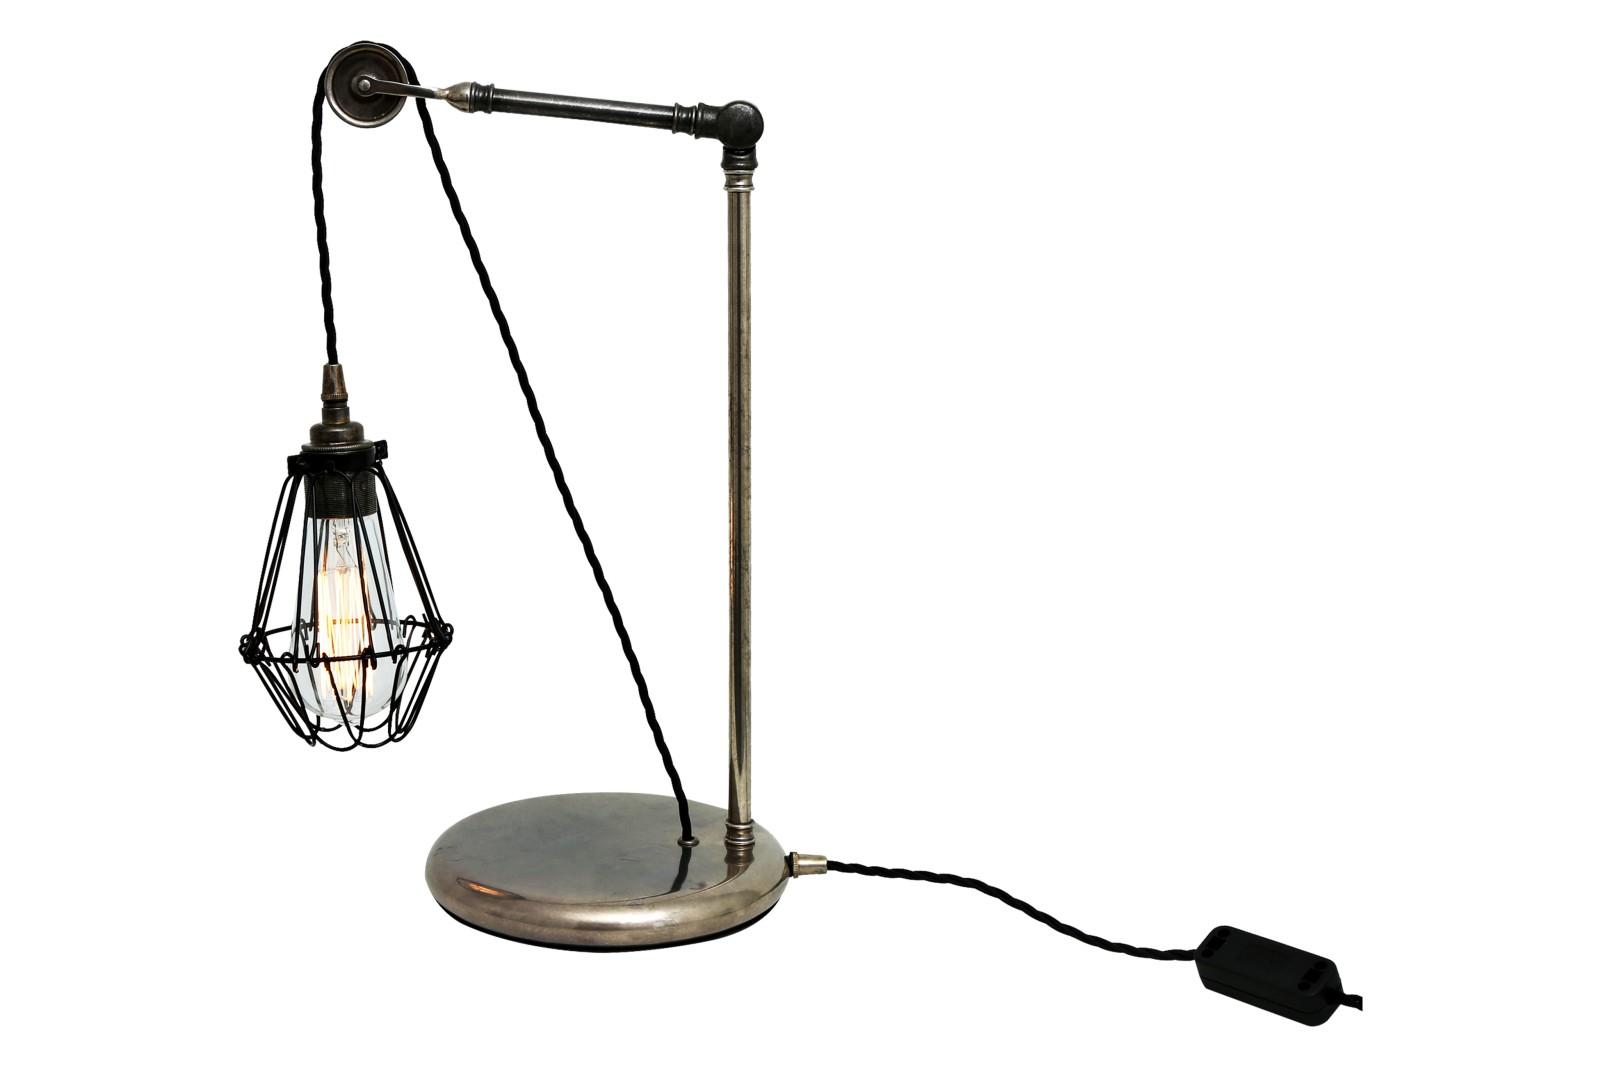 Apoch Table Lamp Antique Silver, EU Plug